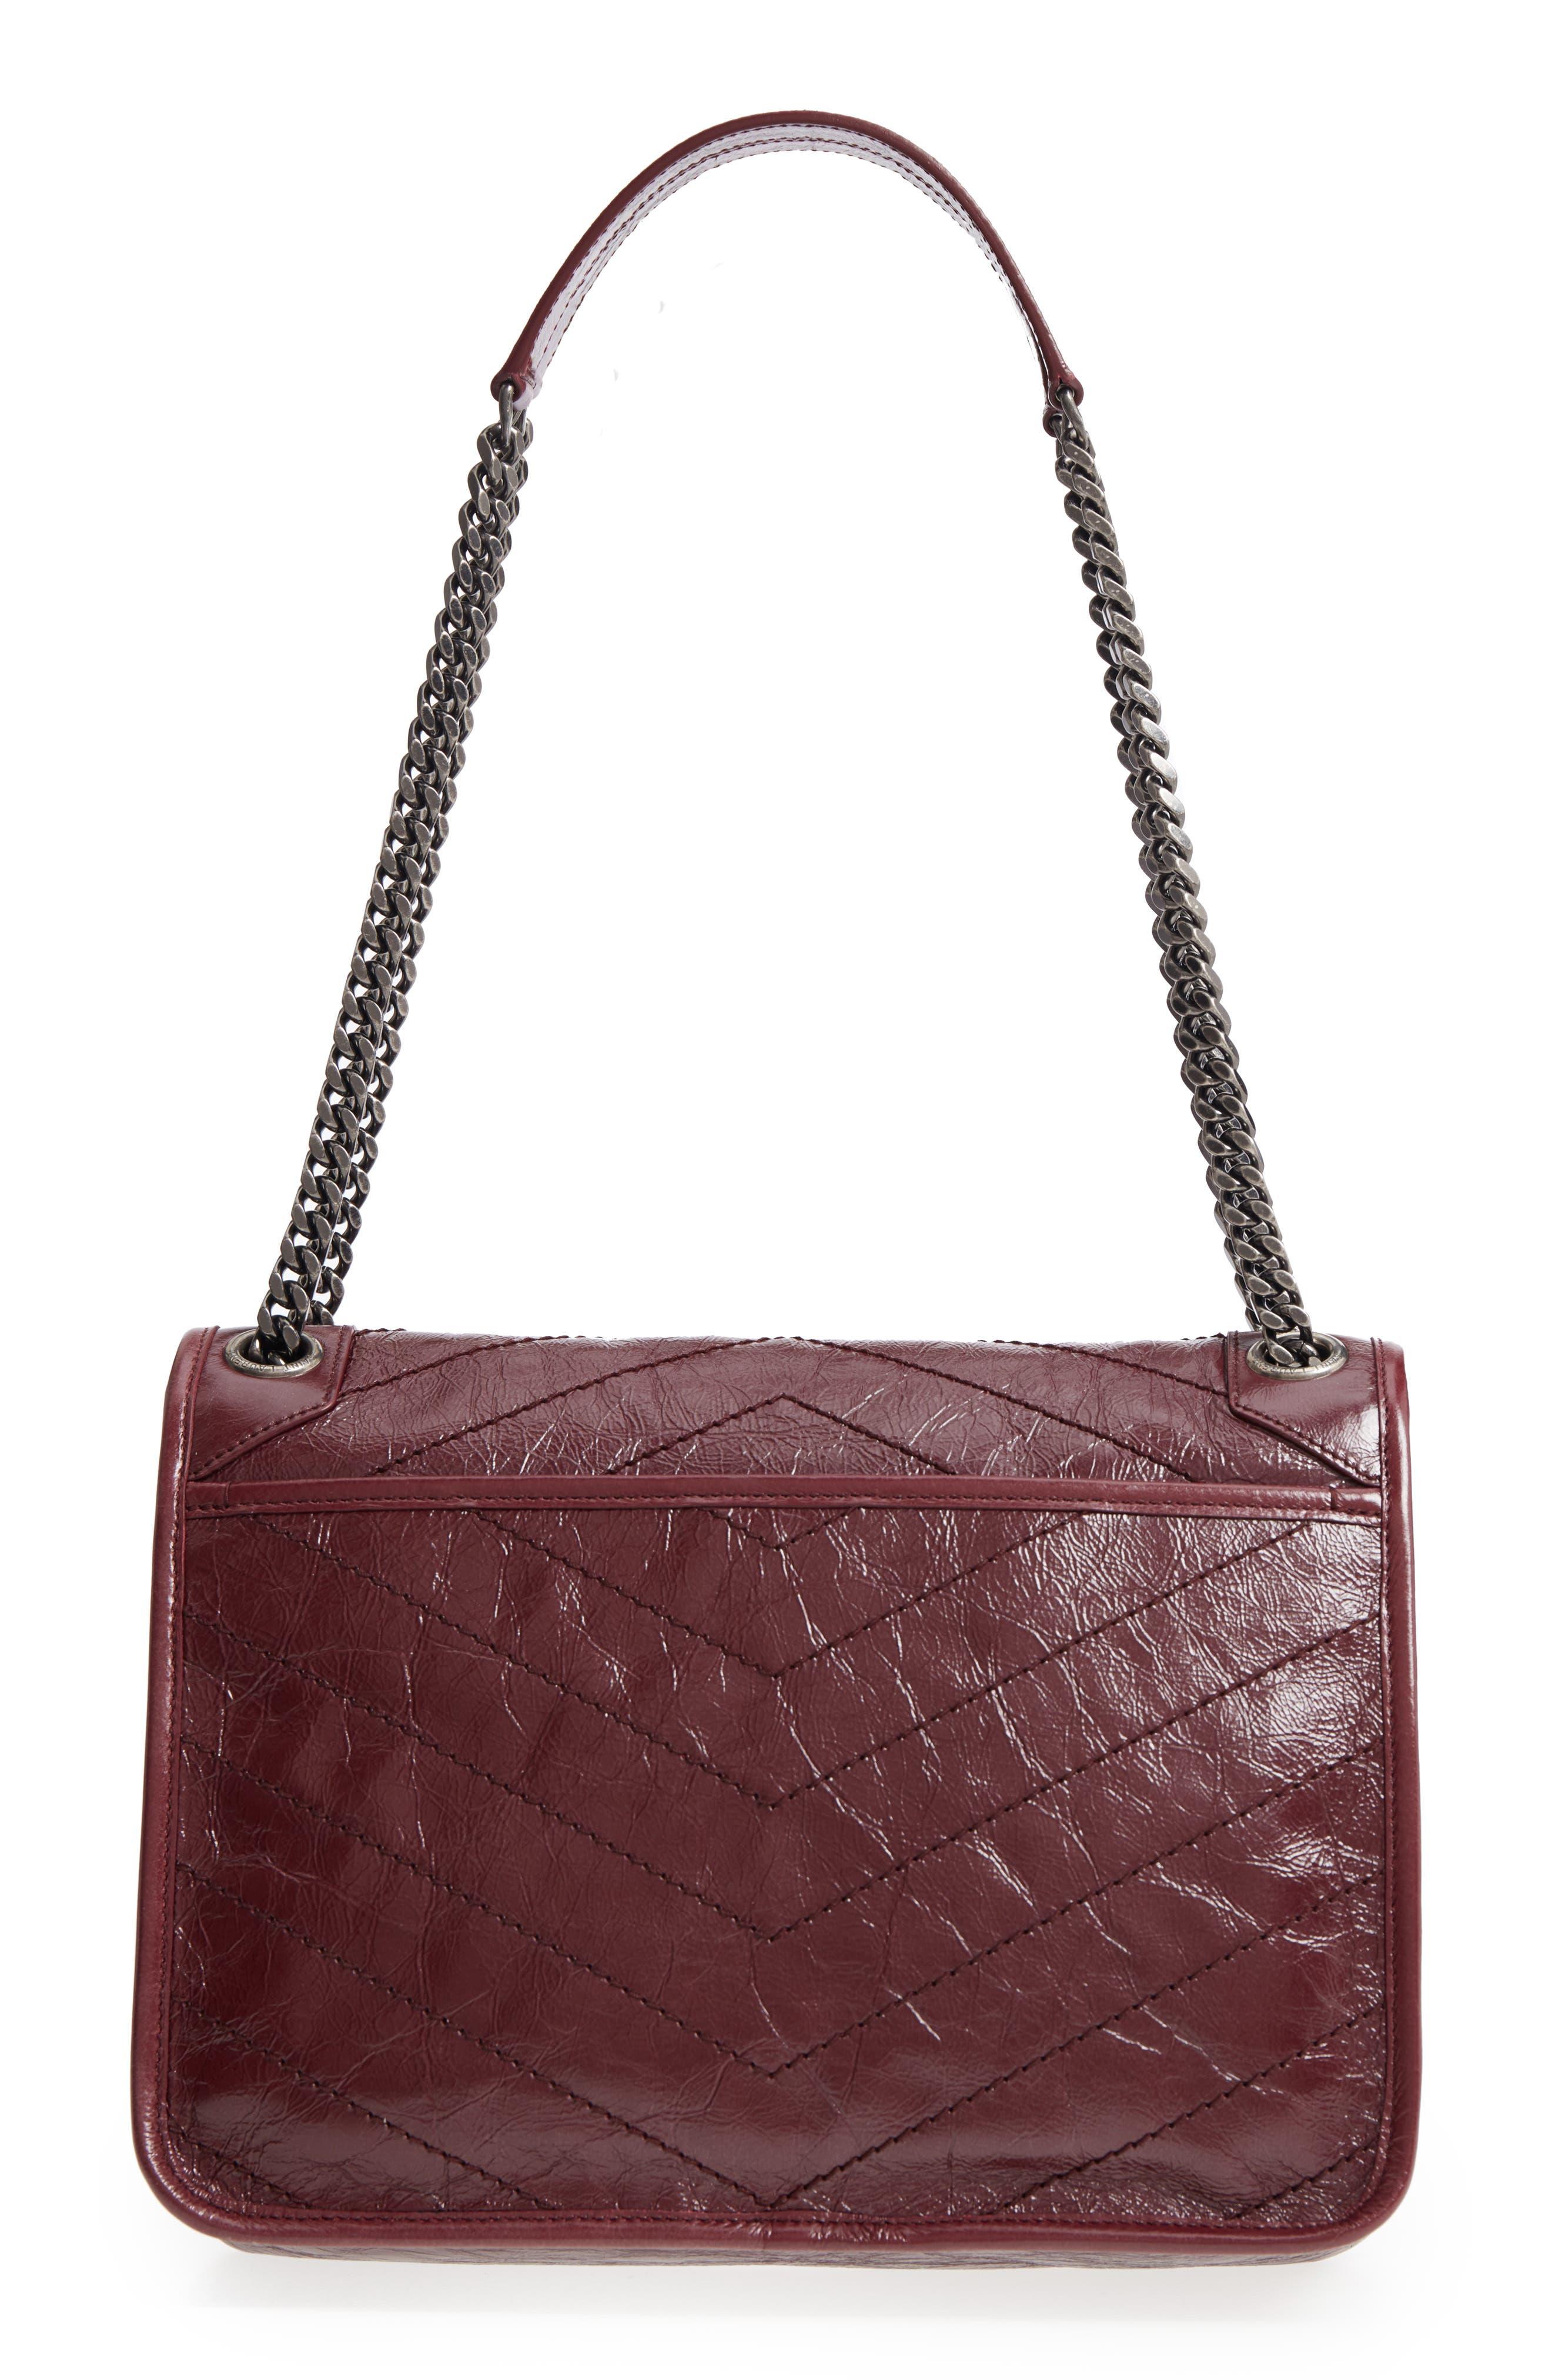 Medium Niki Leather Shoulder Bag,                             Alternate thumbnail 3, color,                             Rouge Legion